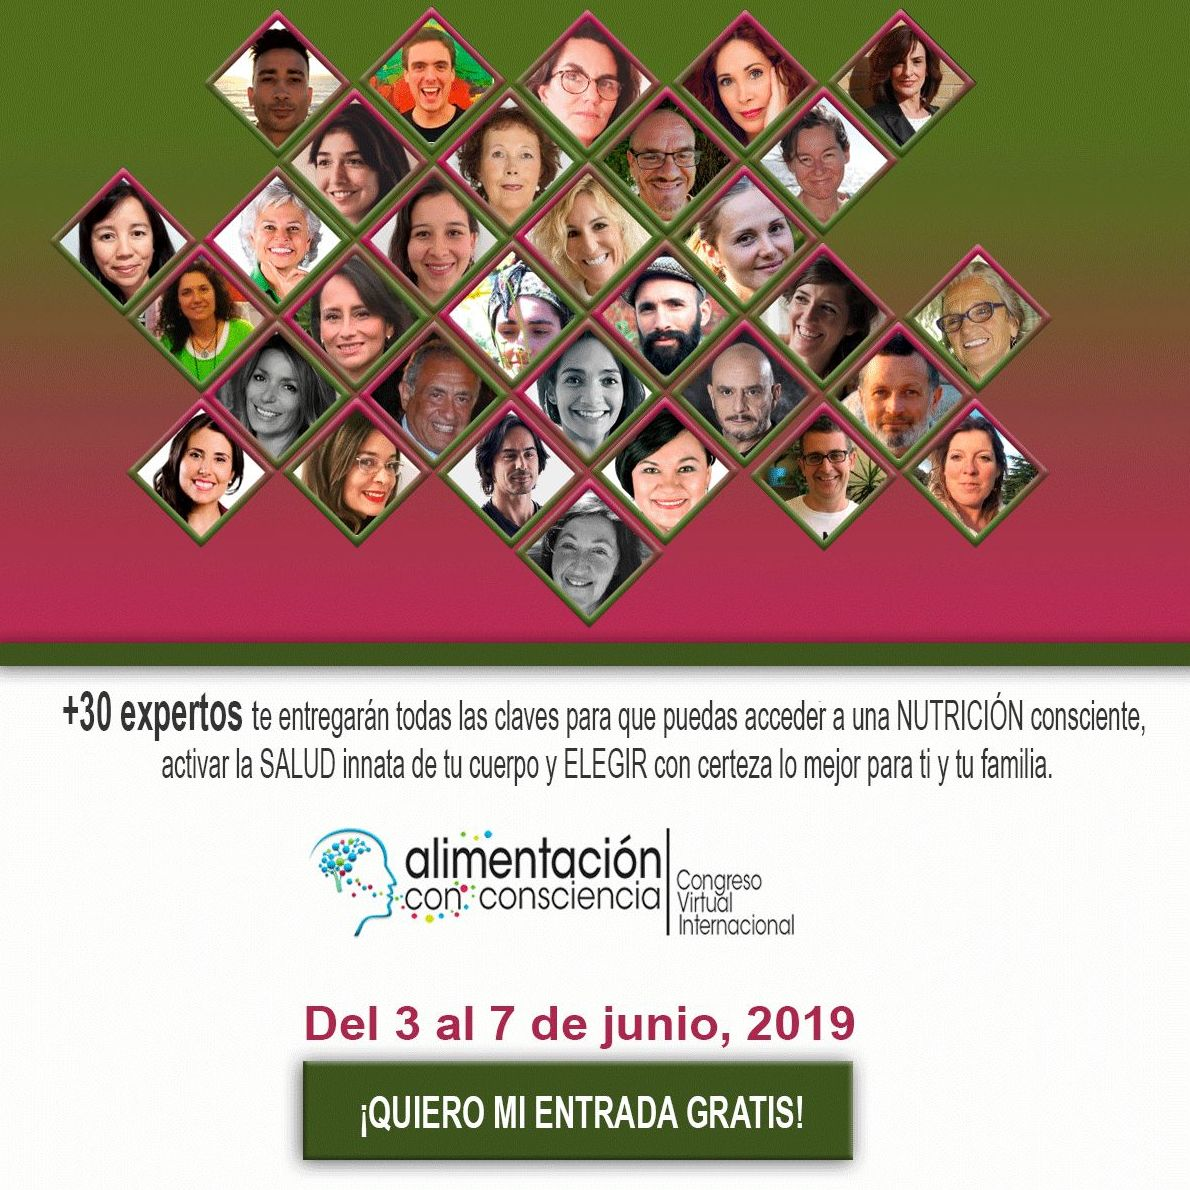 Congreso Virtual Internacional de Alimentación con Conciencia